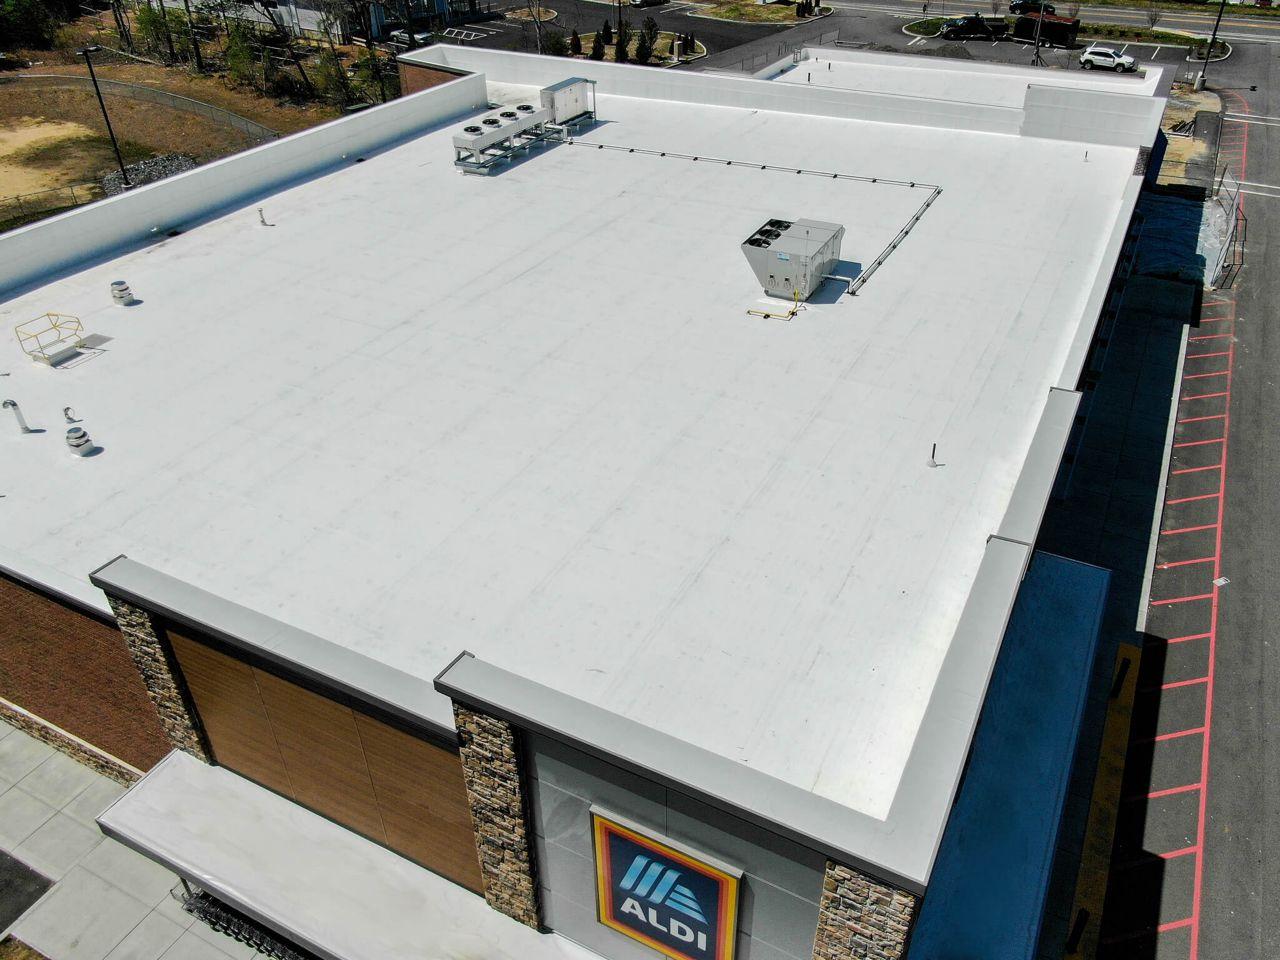 Aldi Grocery Store Sarnafil Roof